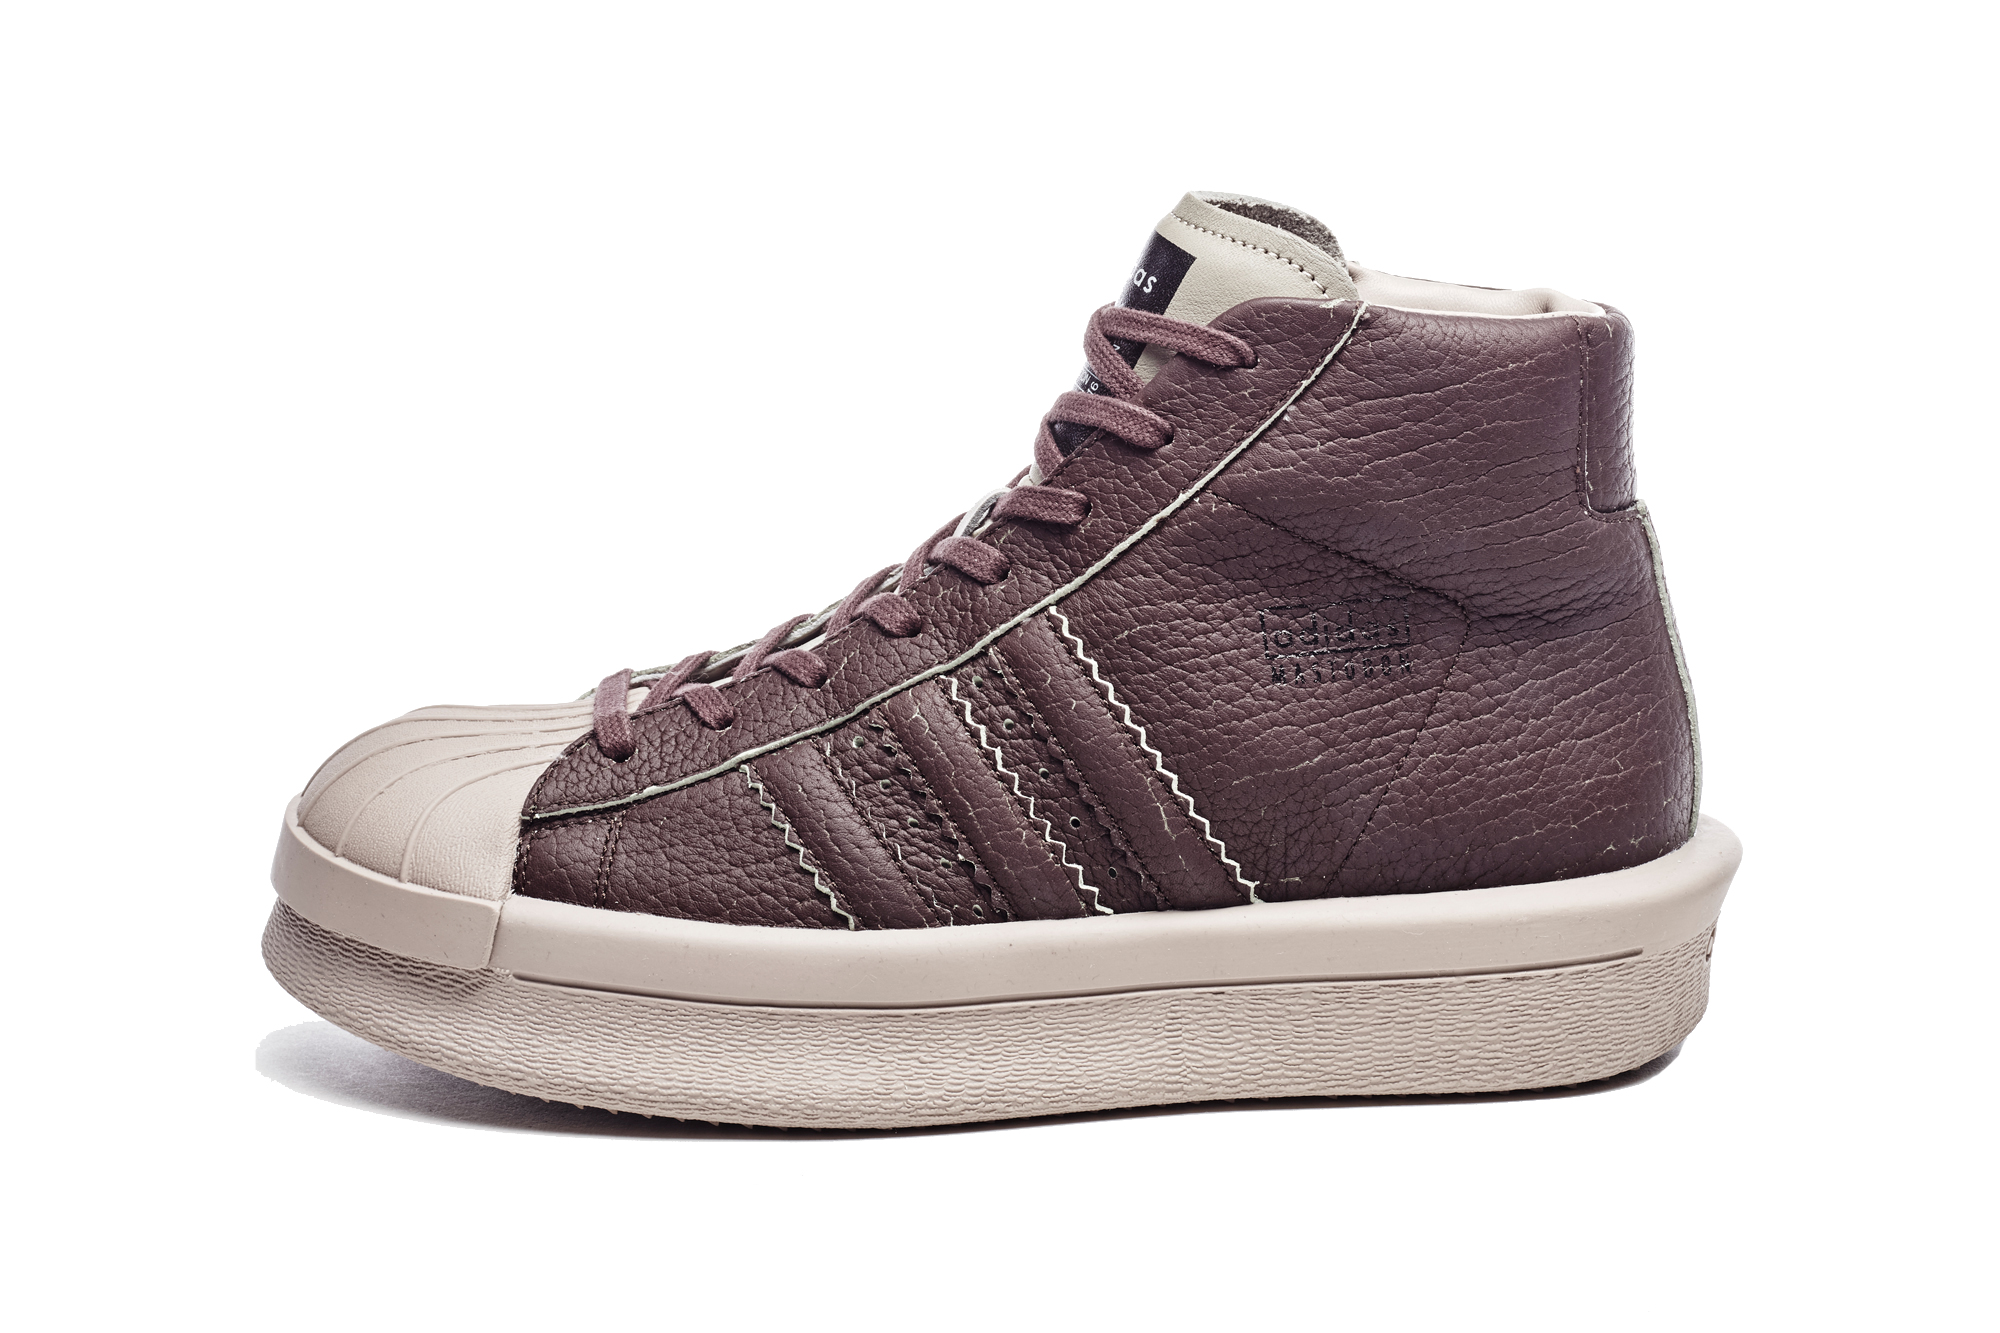 adidas Unveils Four New Colorways of the Rick Owens Mastodon Sneaker